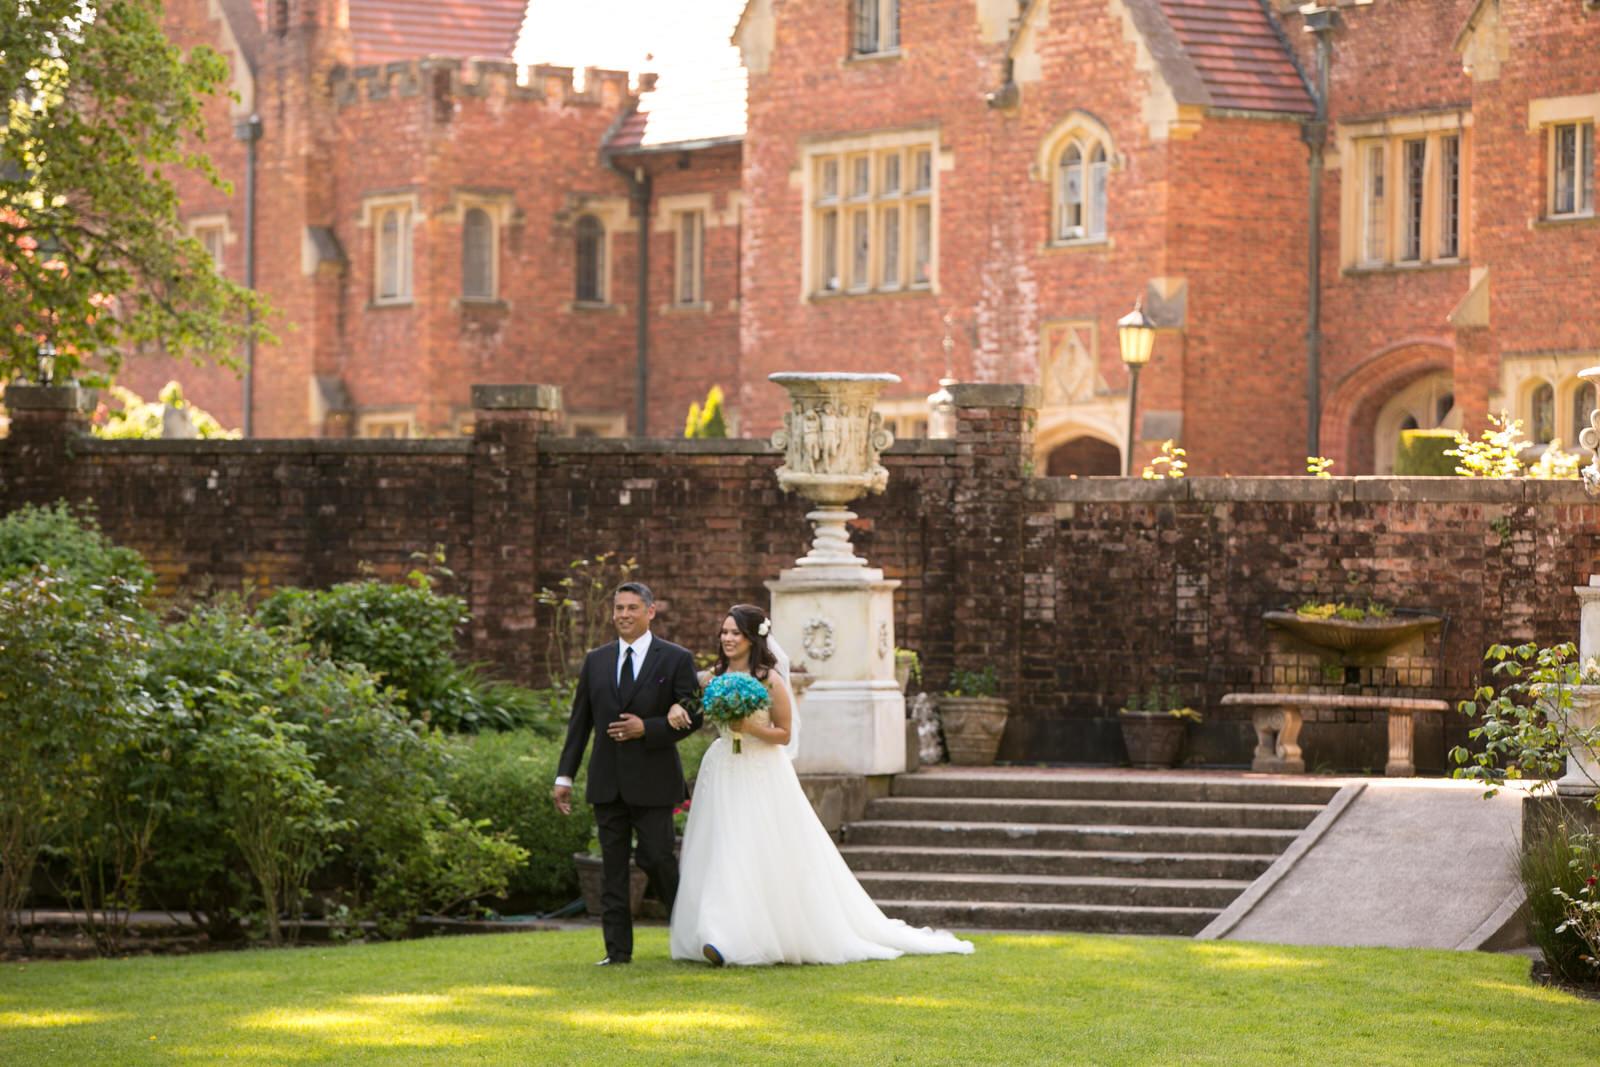 Thornewood Castle Wedding Kate and Daniel Wedding Web18.jpg